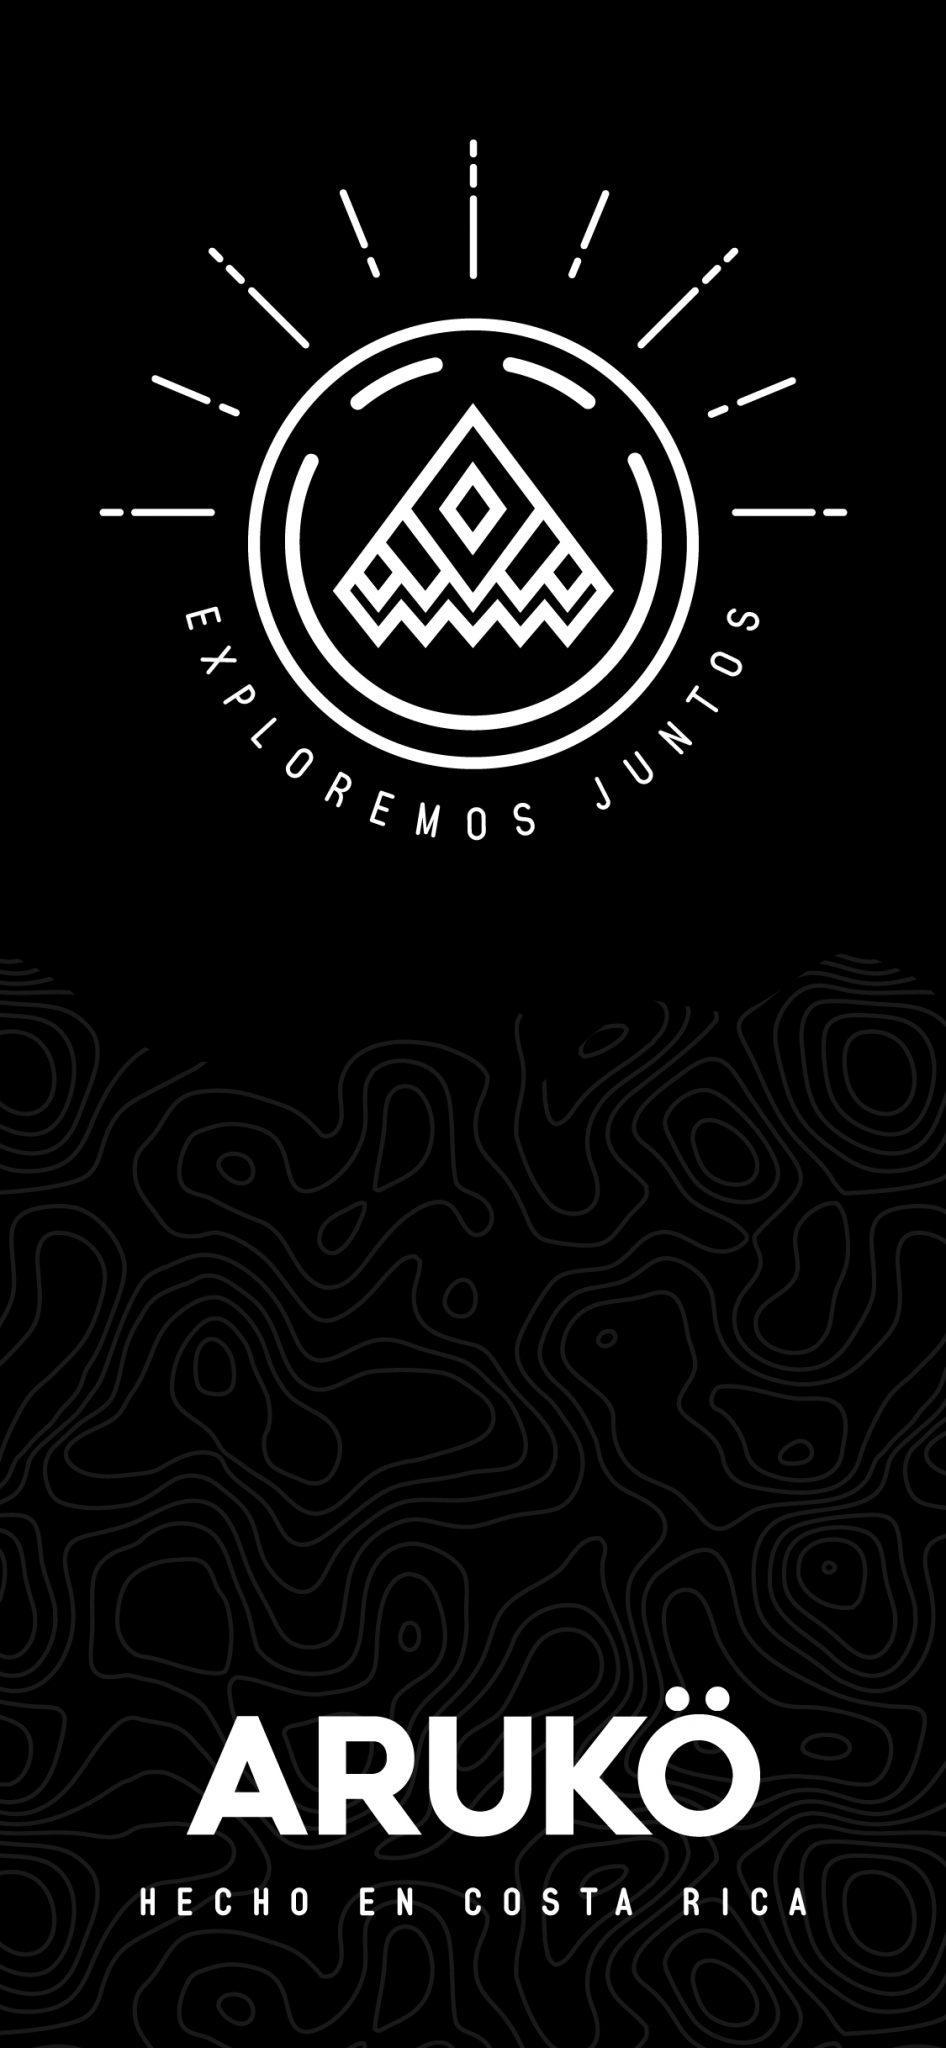 Iphone X Wallpaper2436x1125 Arukö Outdoor Brand